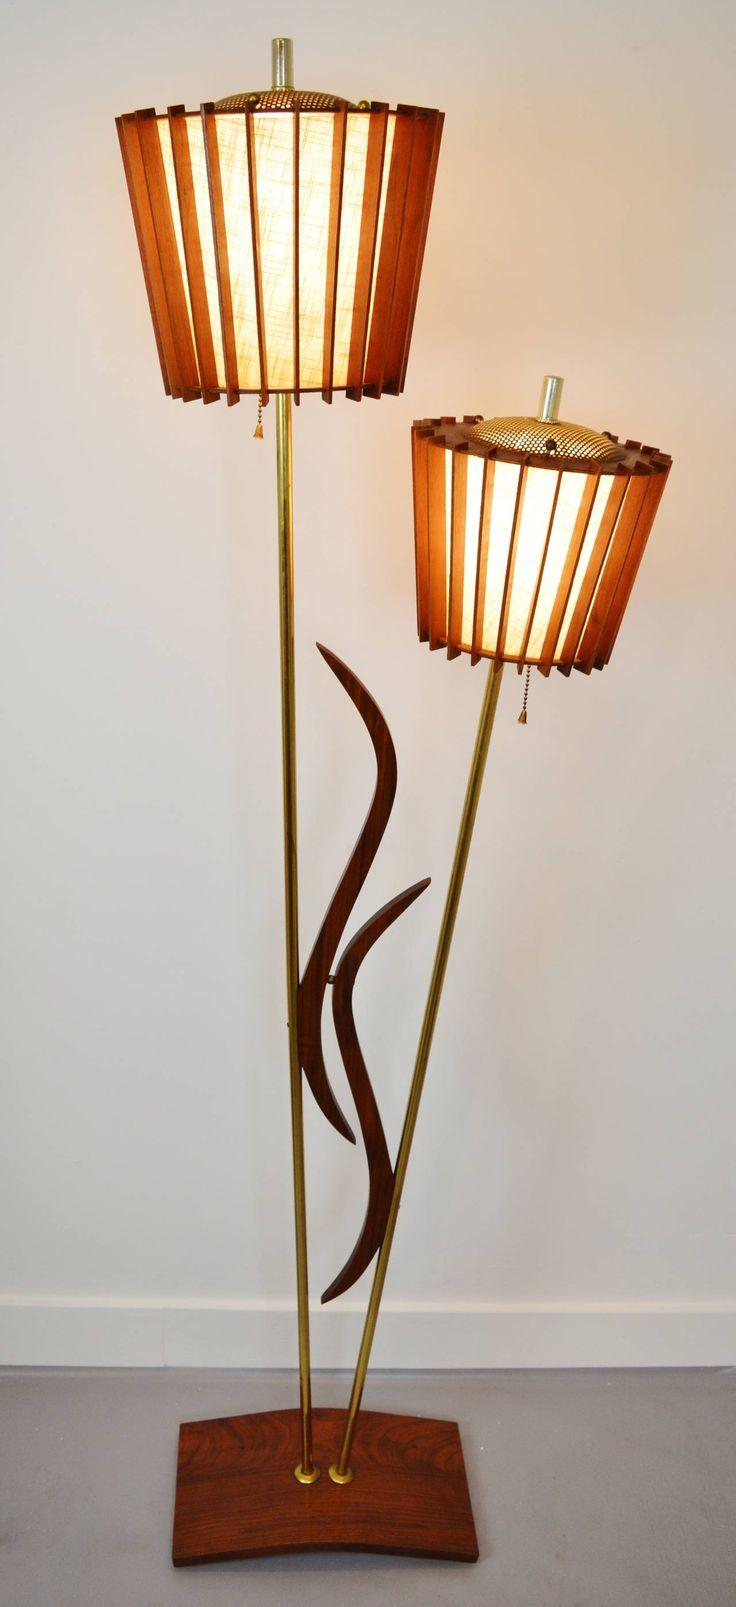 Mid Century Teak Floor Lamp, zero Tiffany lamp in a single side from the room having a modern sleek desk lamp over the room.